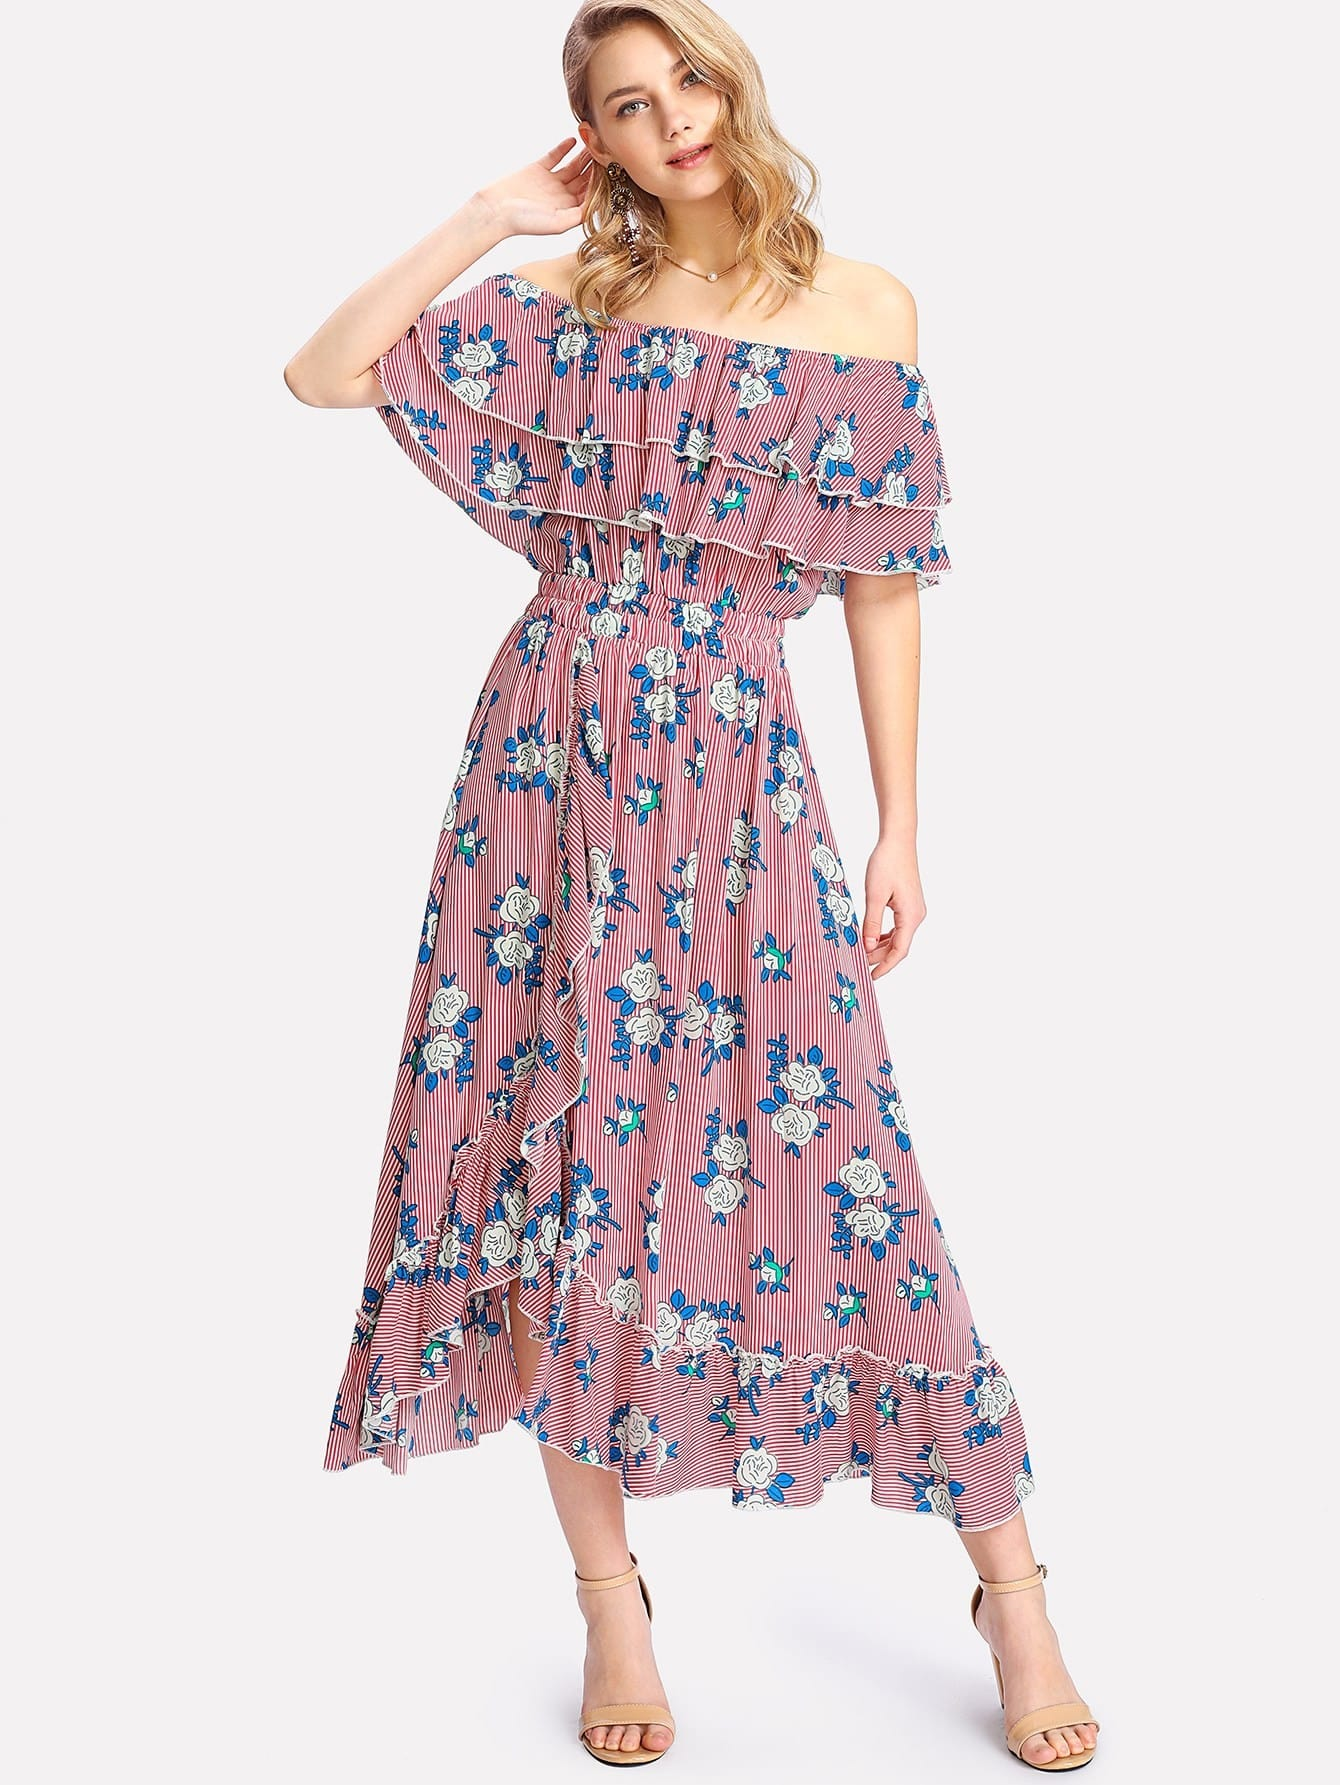 Mixed Print Tiered Ruffle Bardot Dress все цены